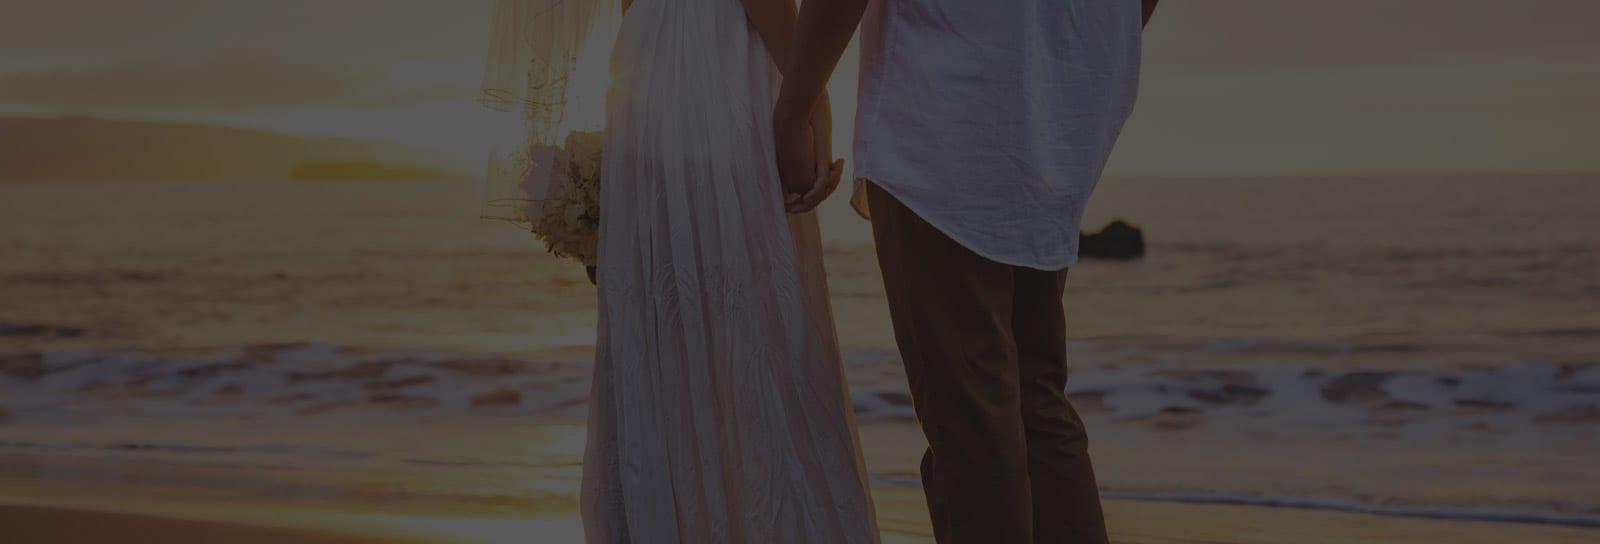 Best Wedding Venue in Florida, The Don Cesar